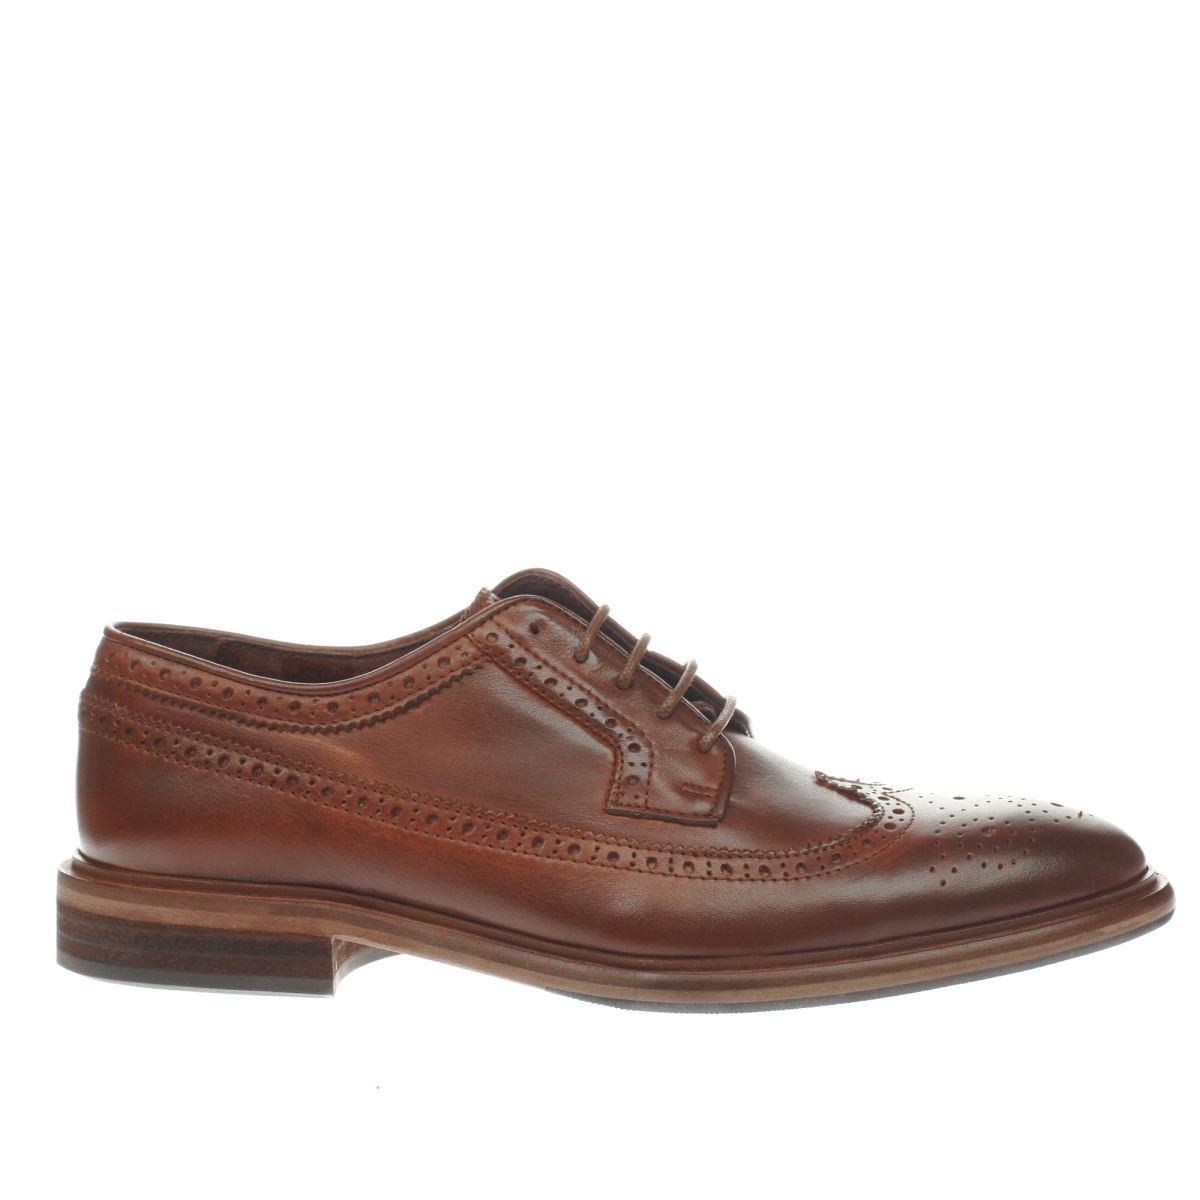 paul smith shoe ps Paul Smith Shoe Ps Brown Malloy Shoes